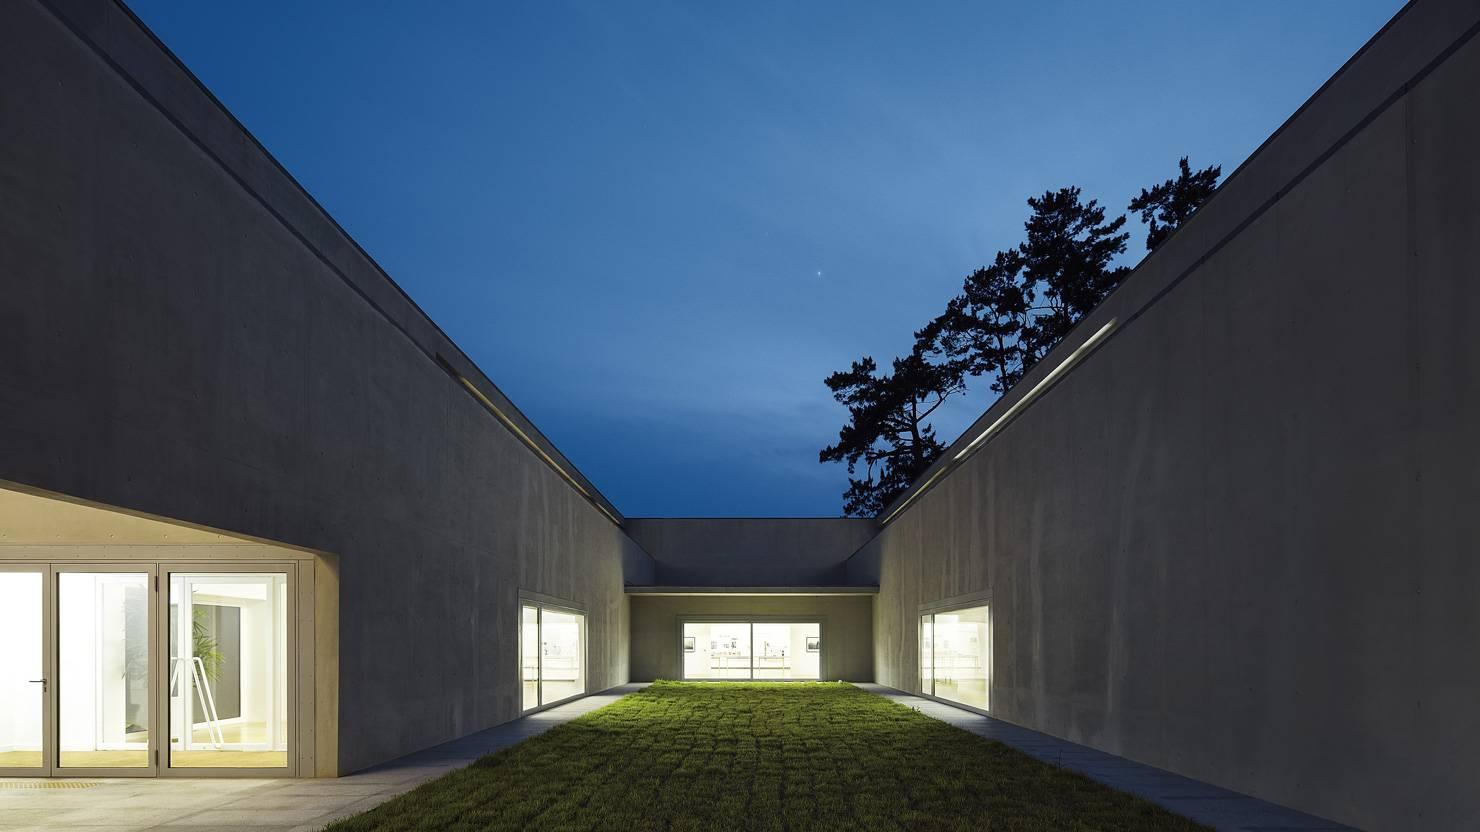 serramenti-acciaio-zincato-hansen-museum-kim-jong-kyu-3_project_big